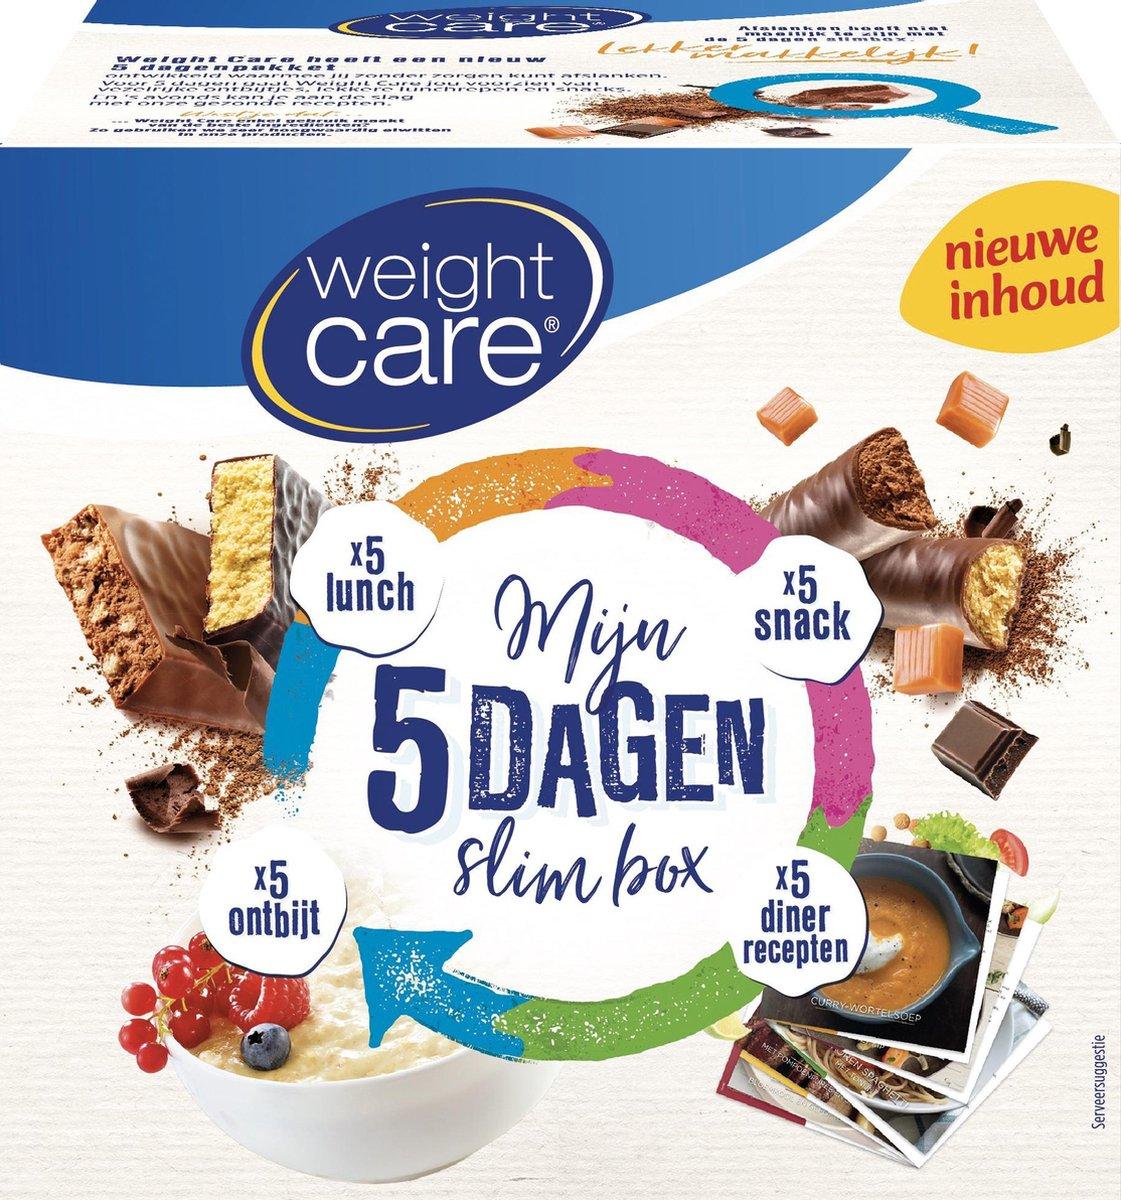 Weight Care 5 Dagen Slimbox Dieetpakket